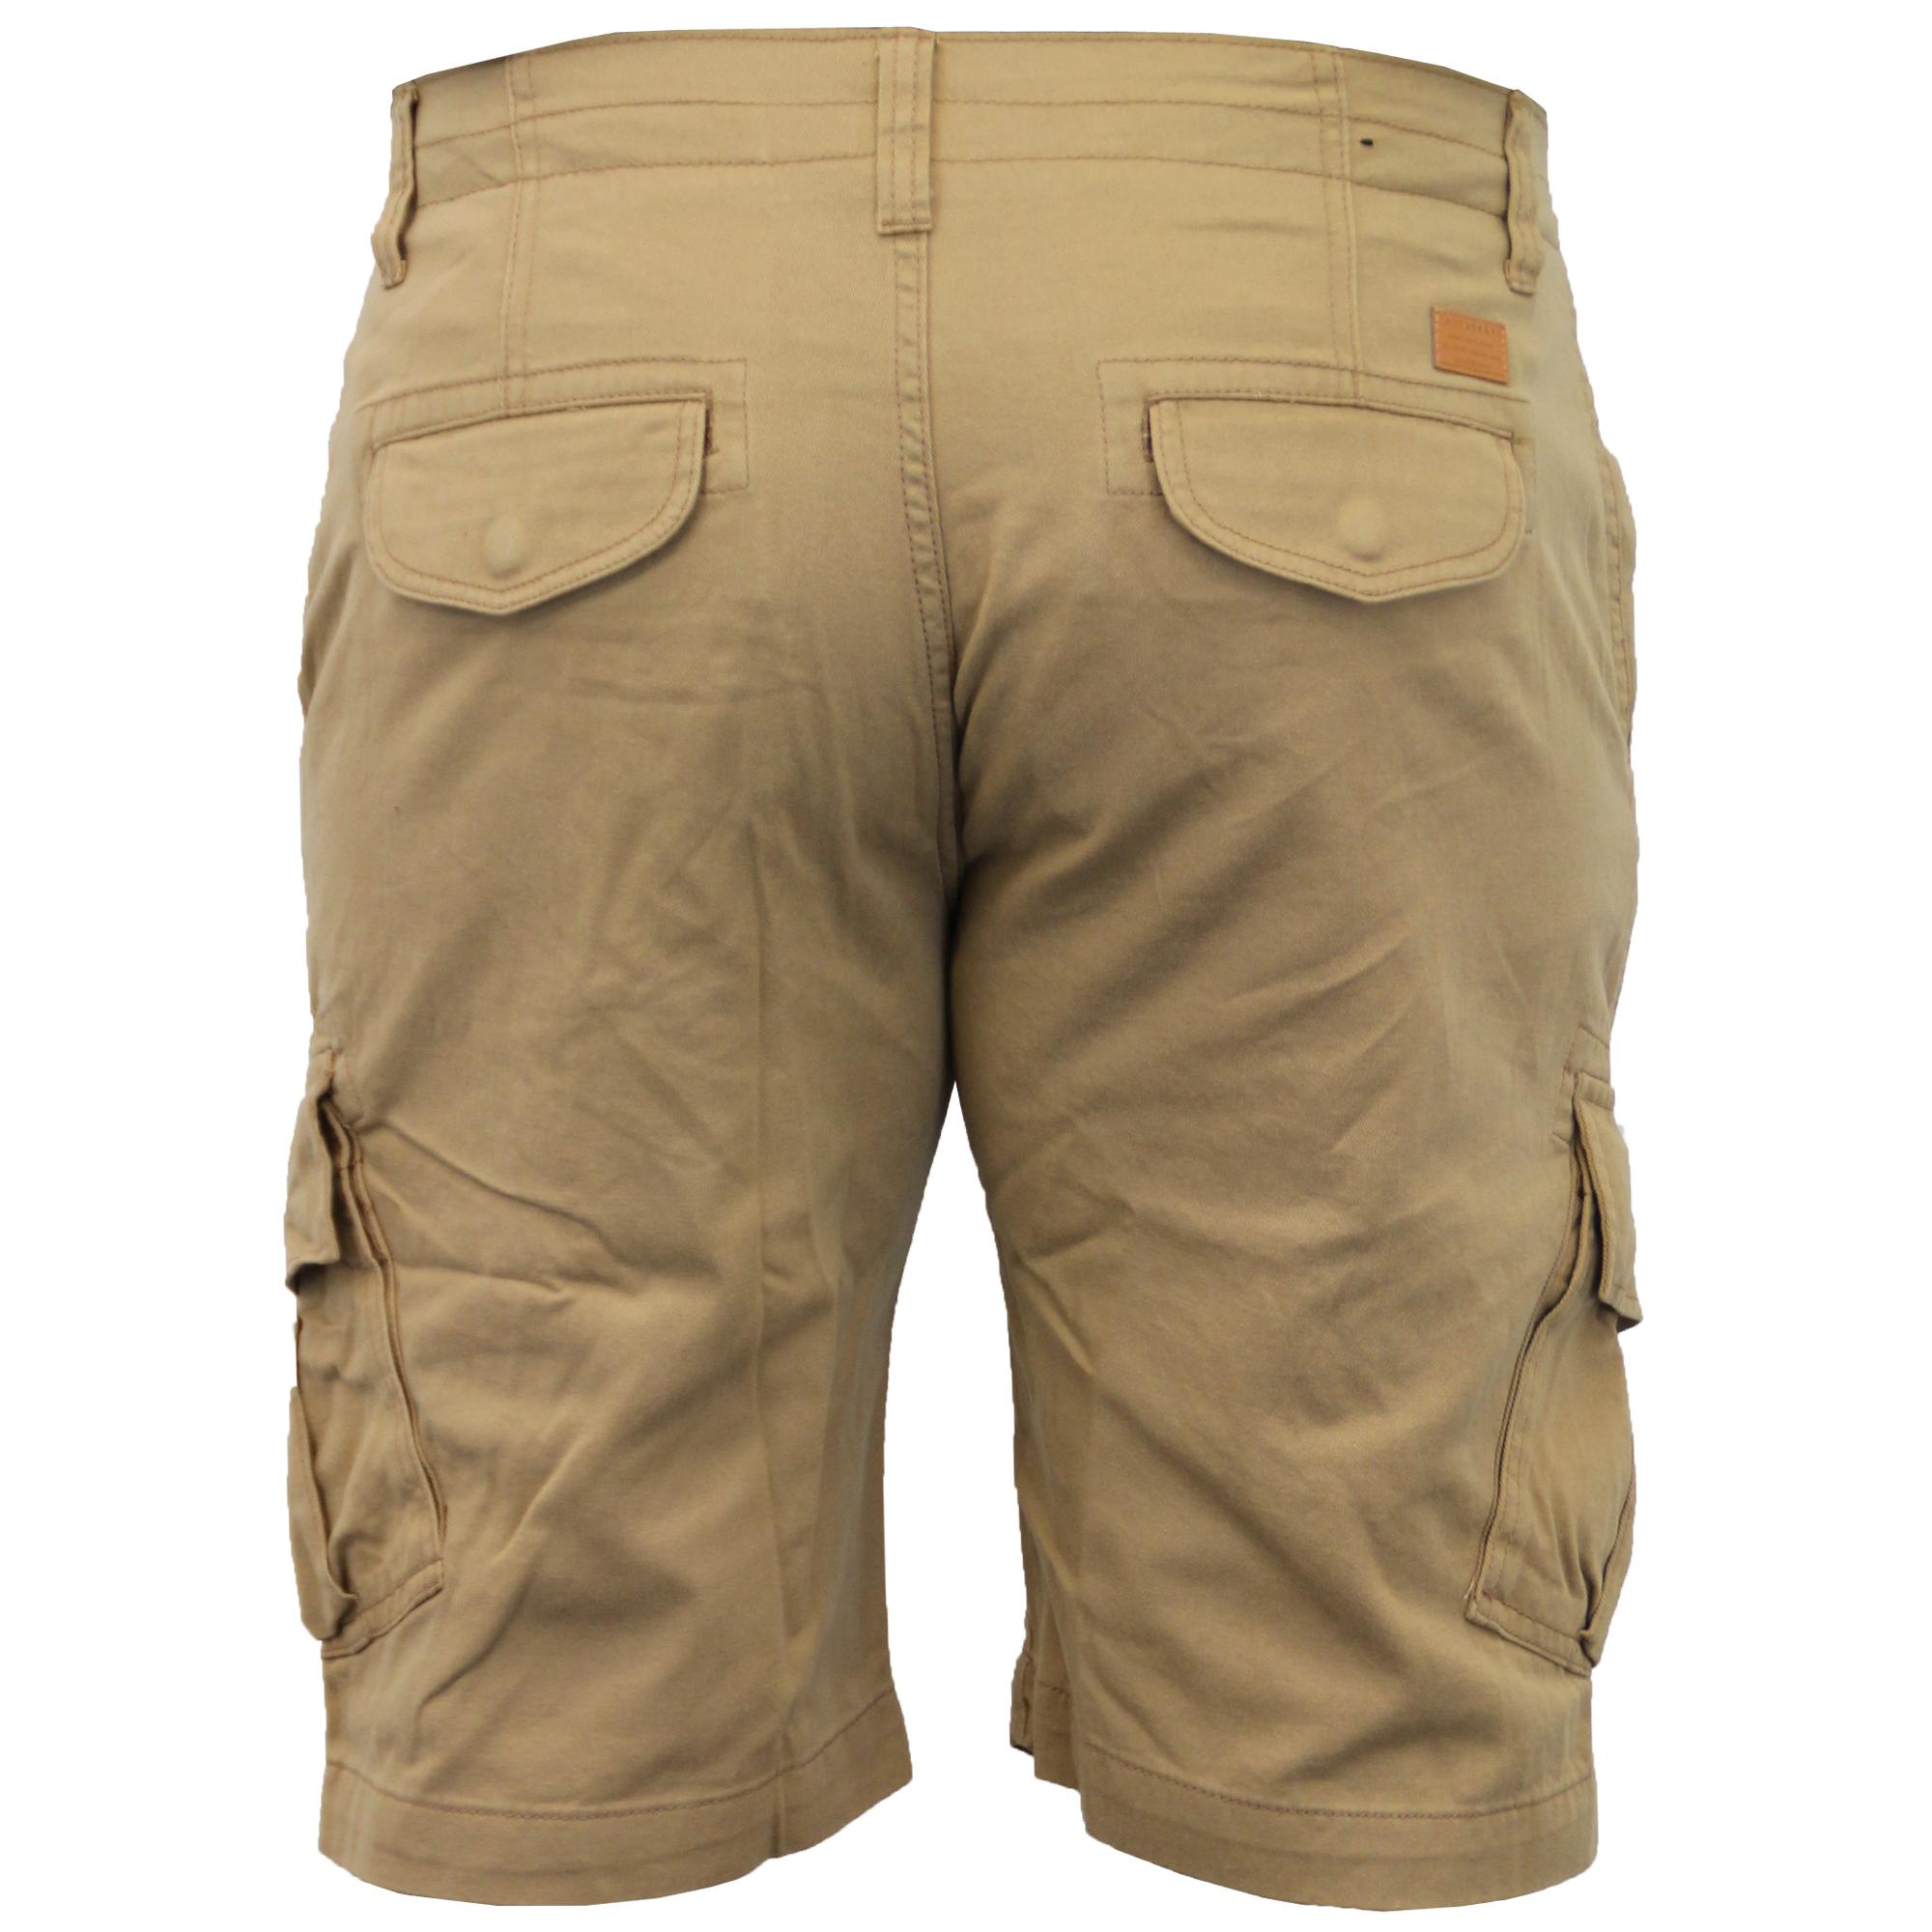 Mens-Cargo-Chino-Shorts-Threadbare-Combat-Knee-Length-Westace-Military-Summer thumbnail 24